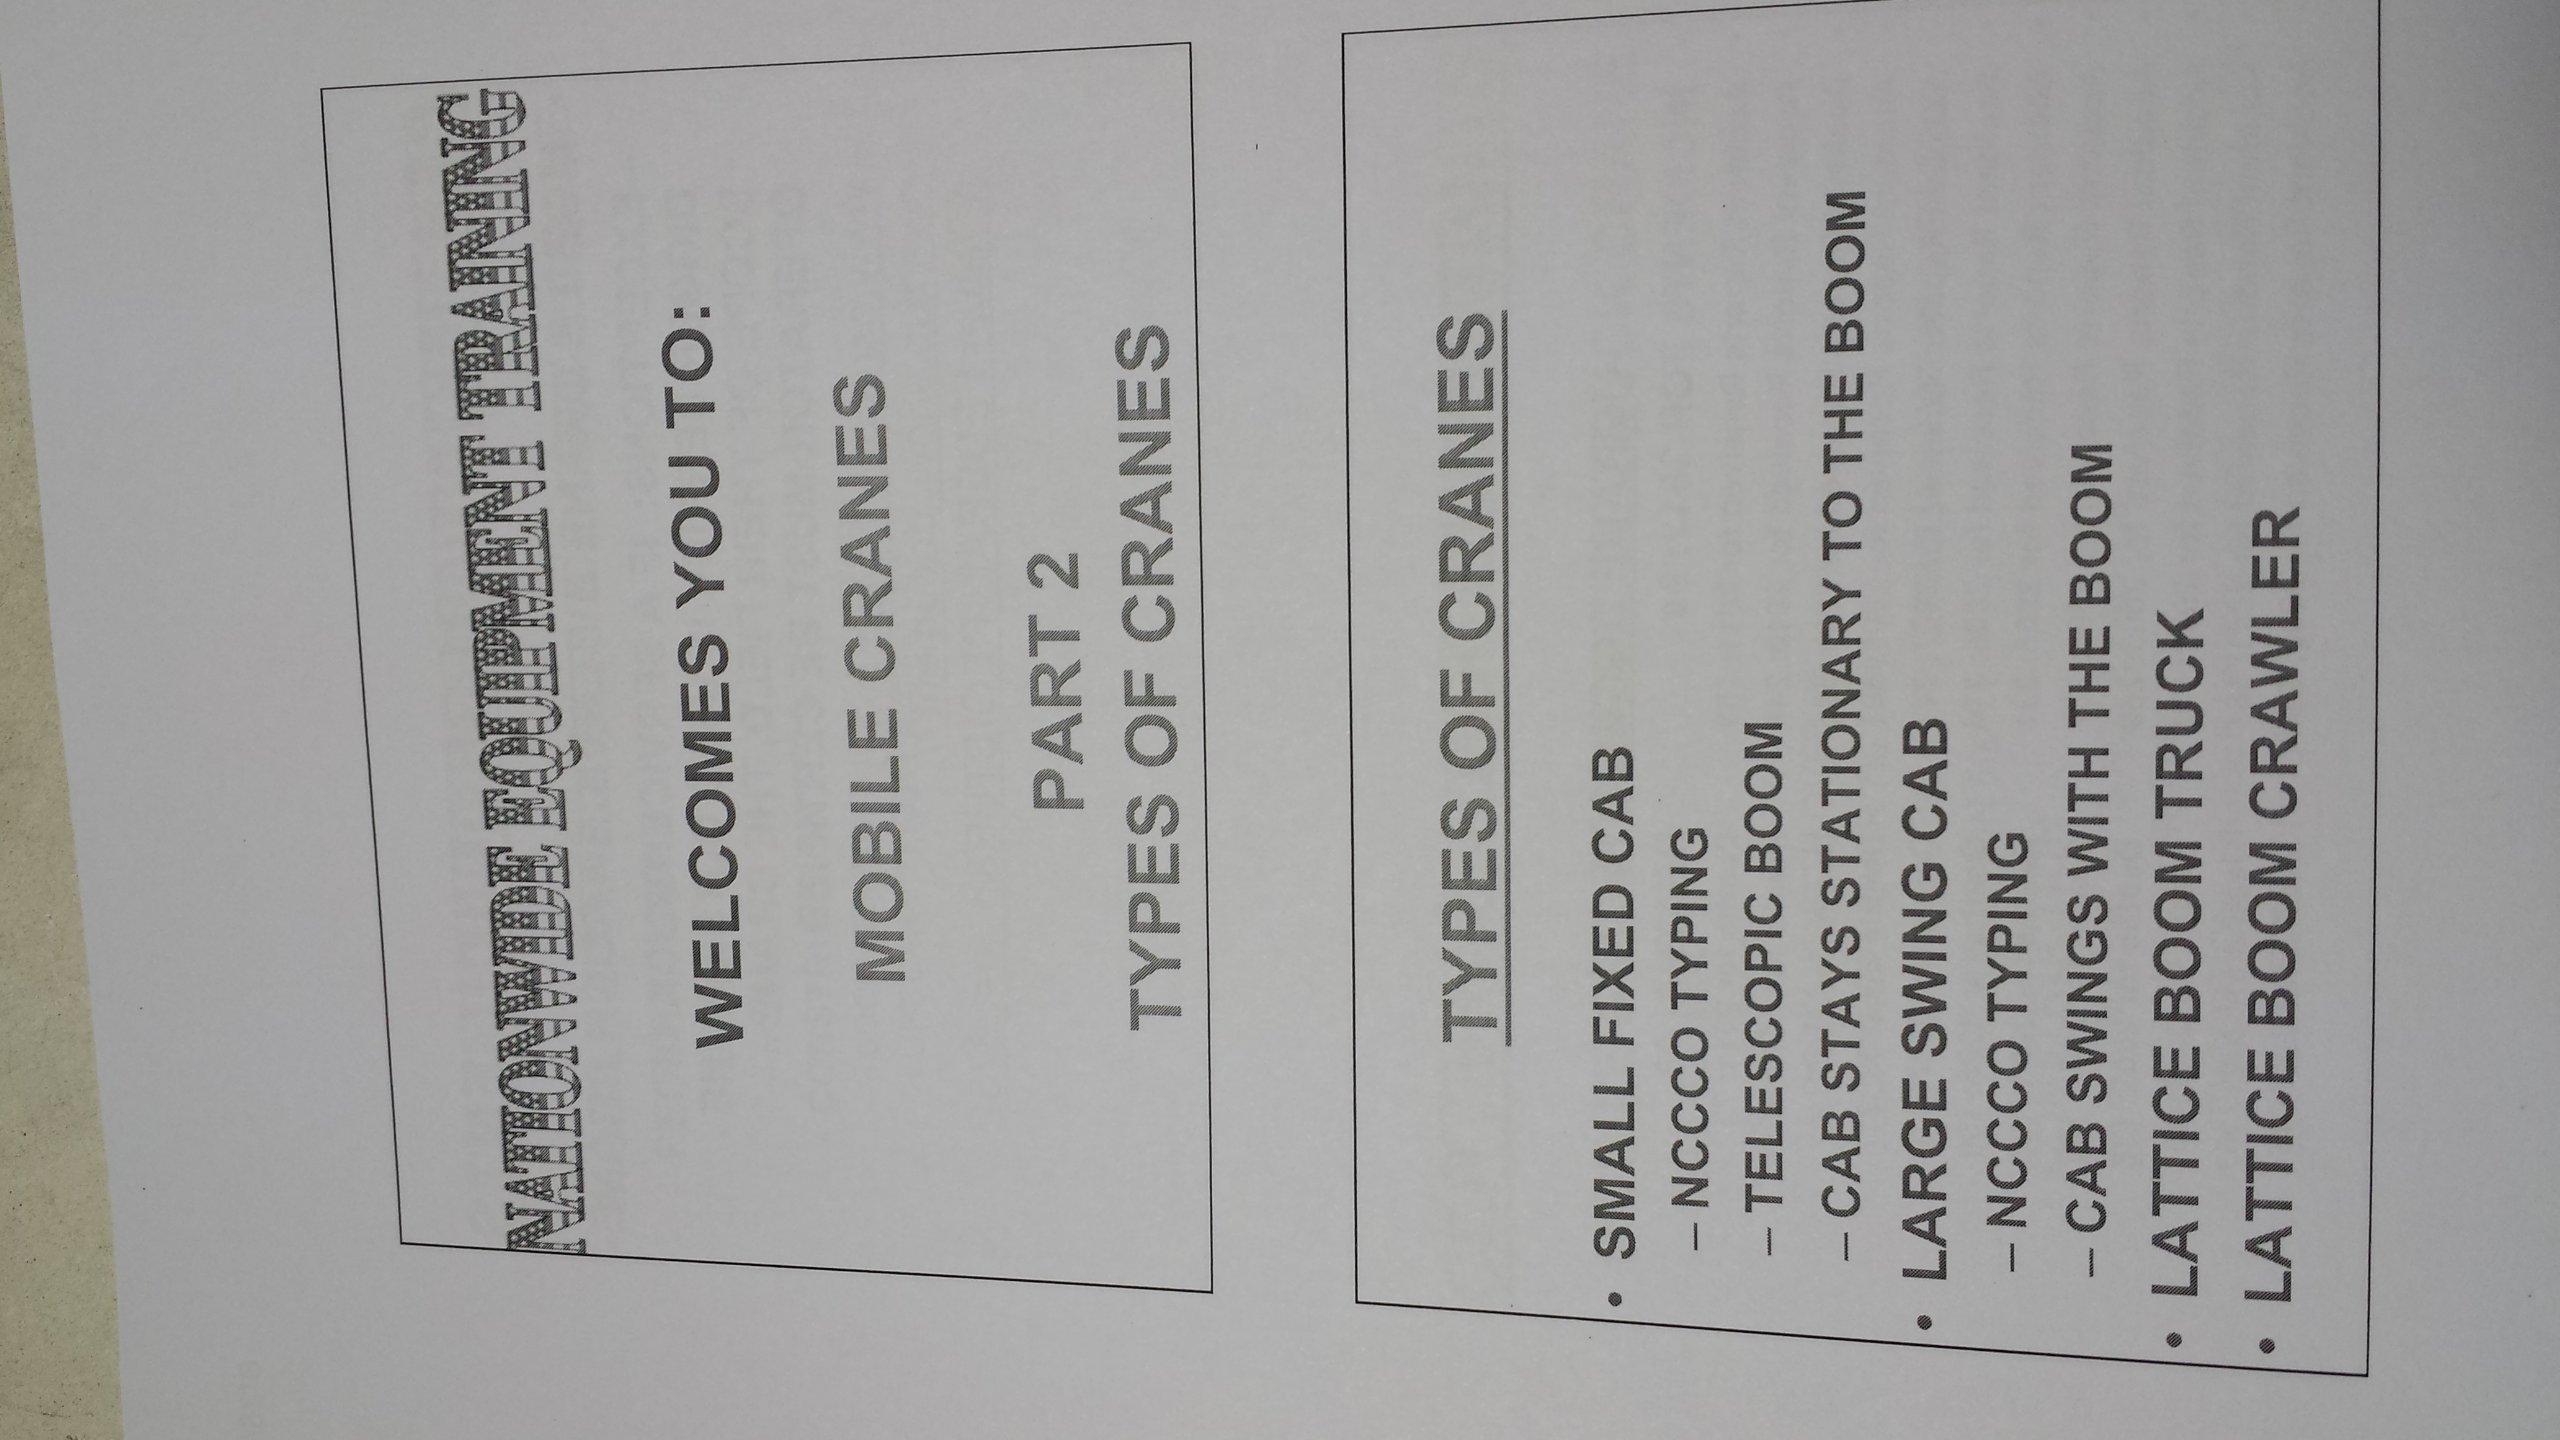 mobile crane operator study material don childers 9780615931715 rh amazon com ncco study guide nafcu nccco lift director study guide